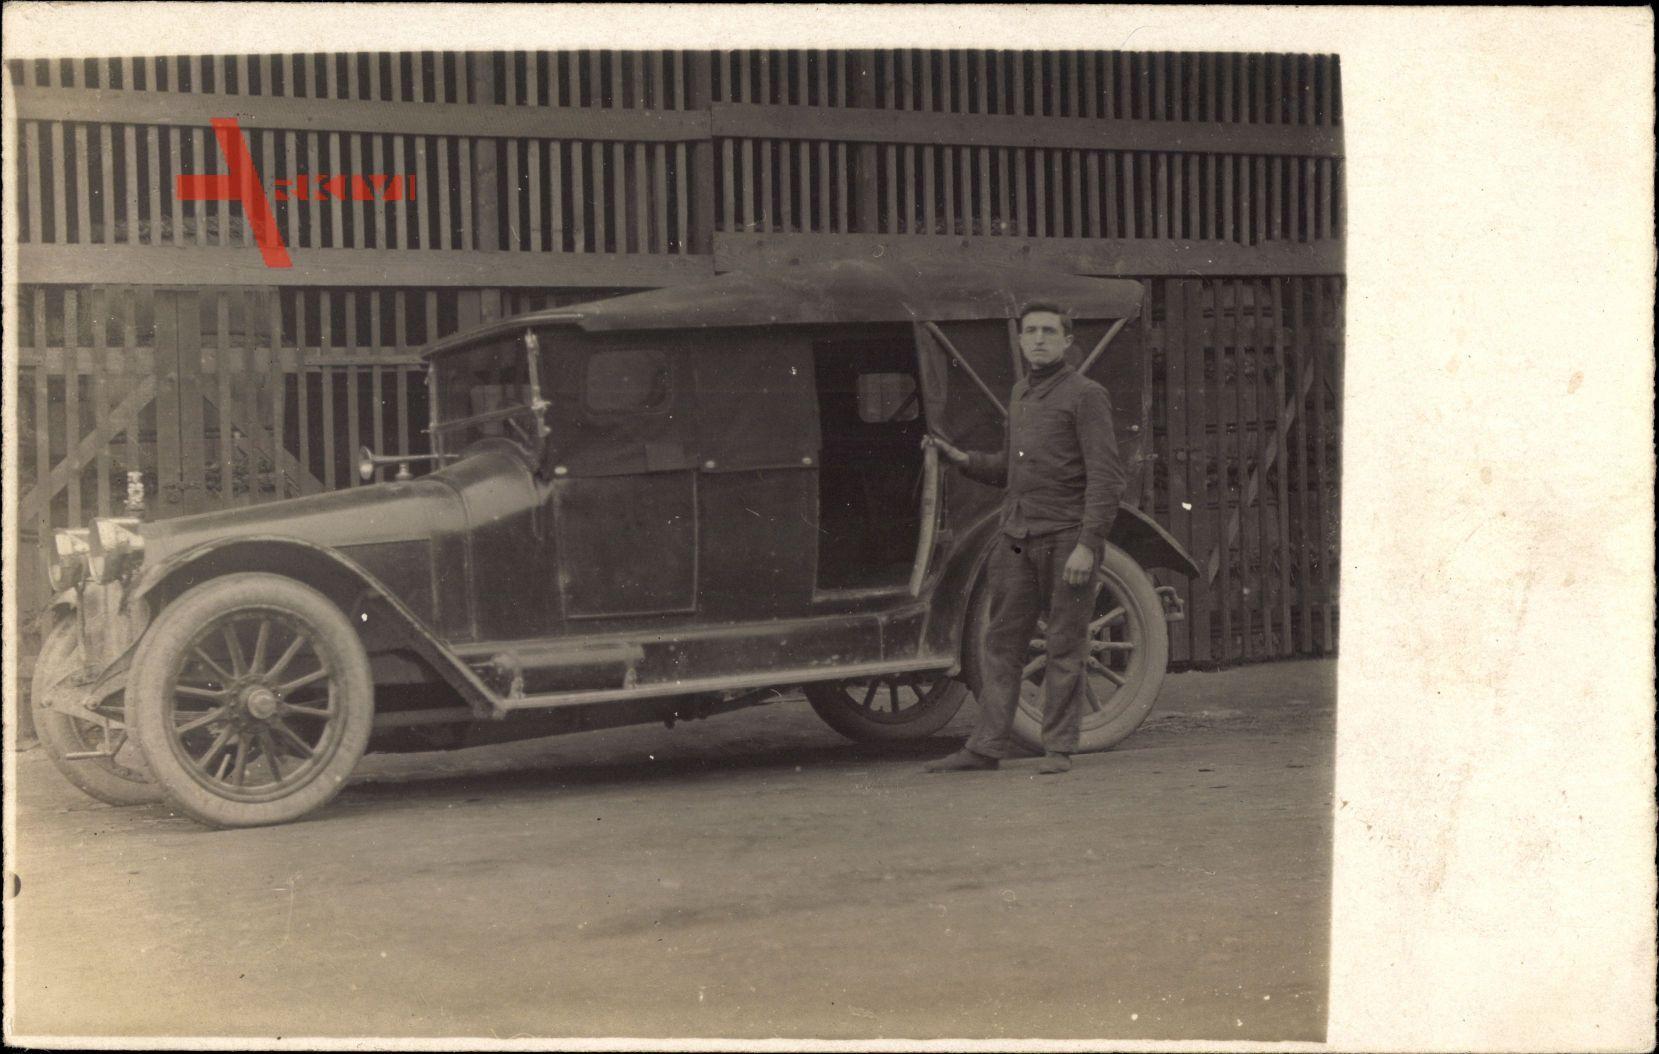 Frankreich, Automobil, Viertürer, Fahrer, Oldtimer